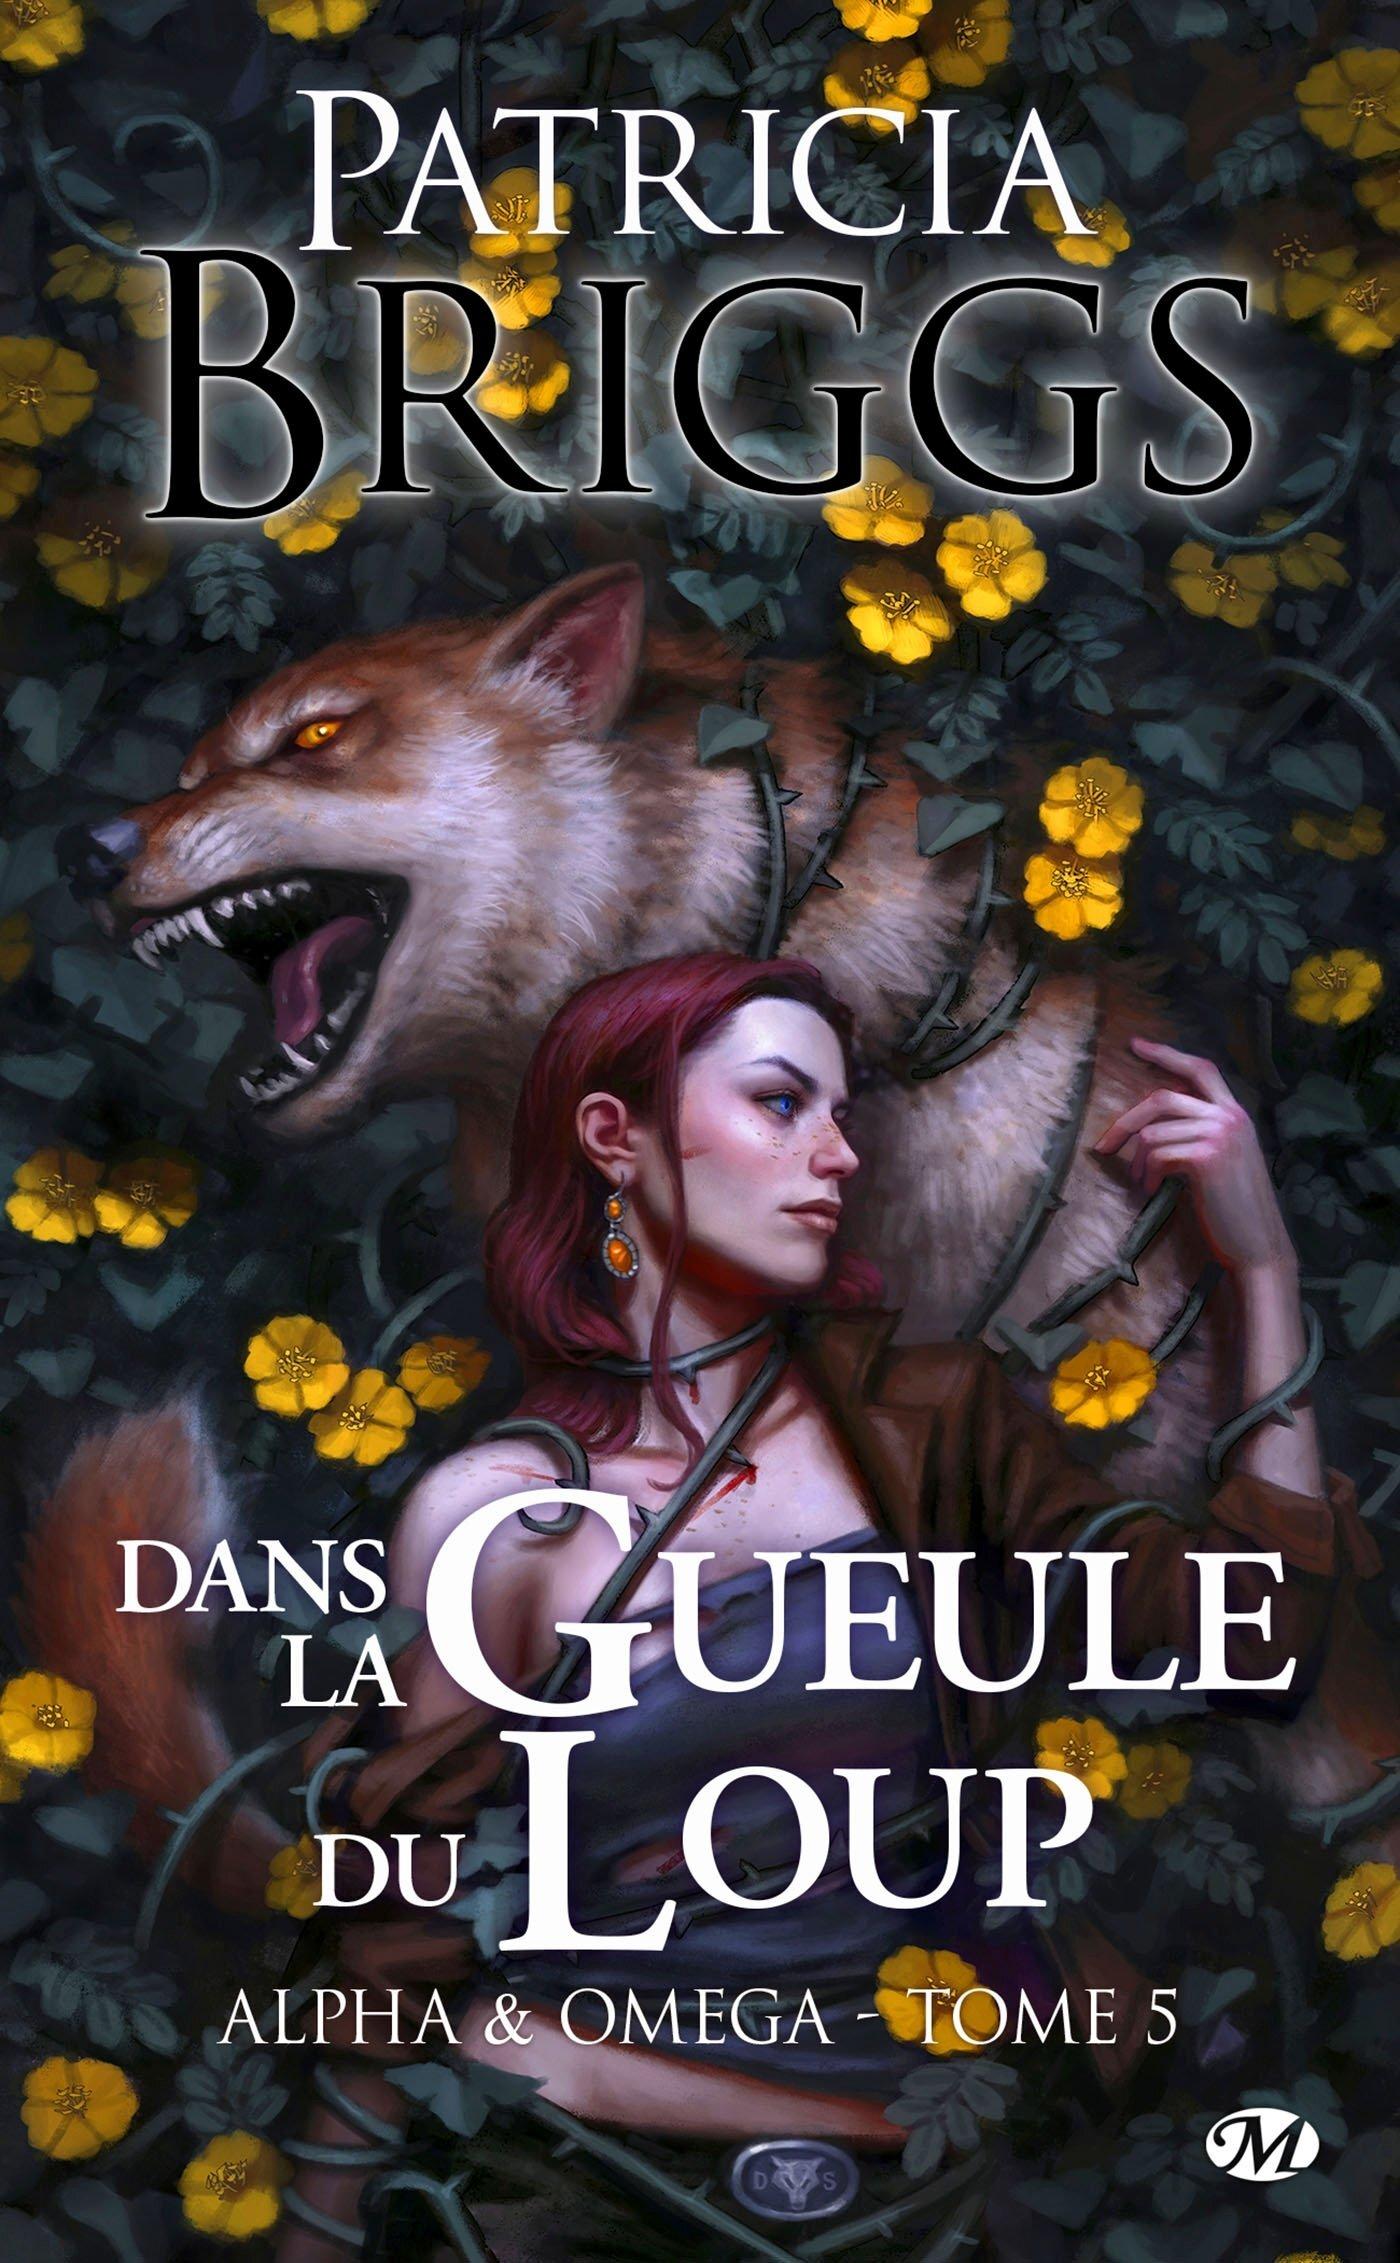 cdn1.booknode.com/book_cover/1061/full/alpha-omega-tome-5-dans-la-gueule-du-loup-1061090.jpg